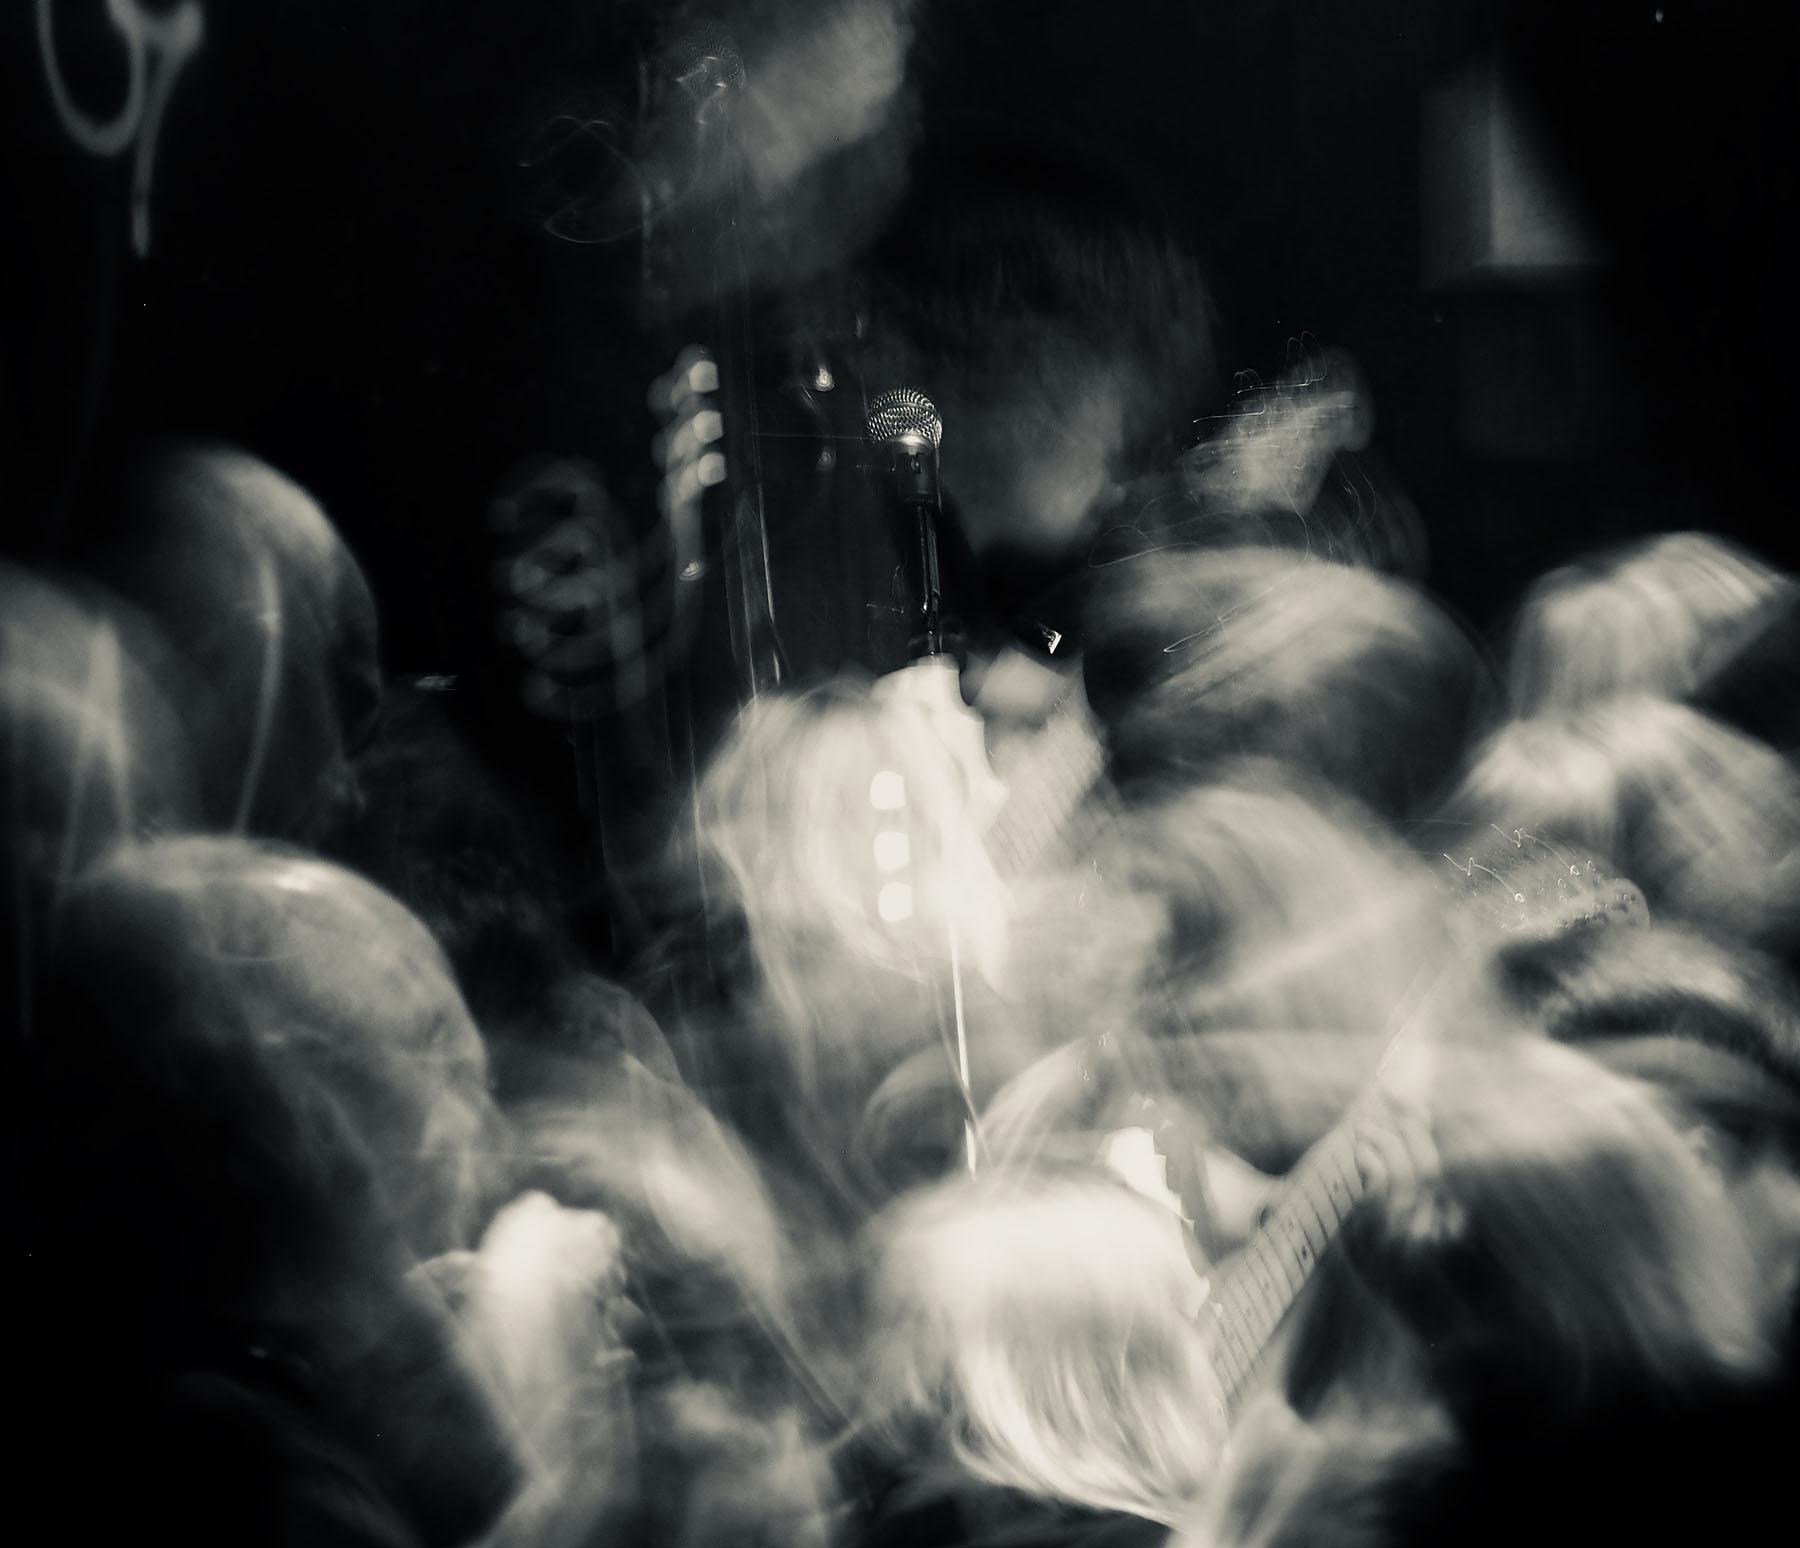 Amanda_Rittenhouse_Lost in a Crowd.jpg